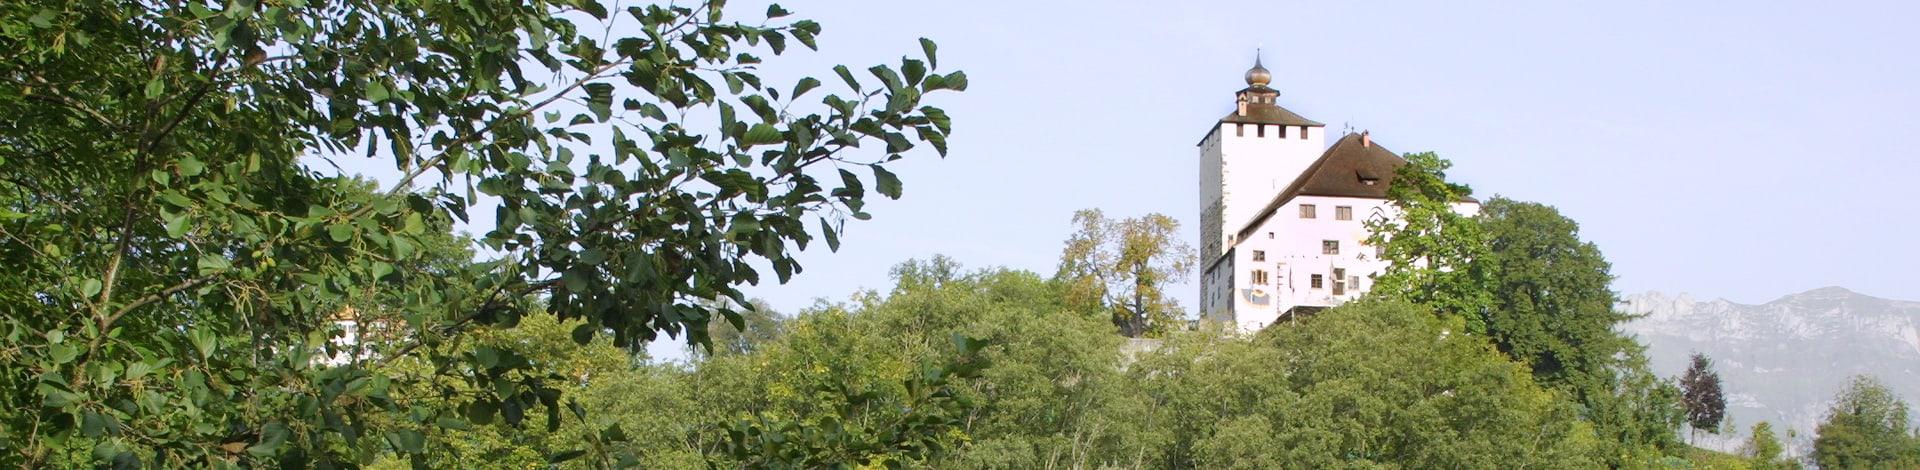 campagna nella regione di Buchs